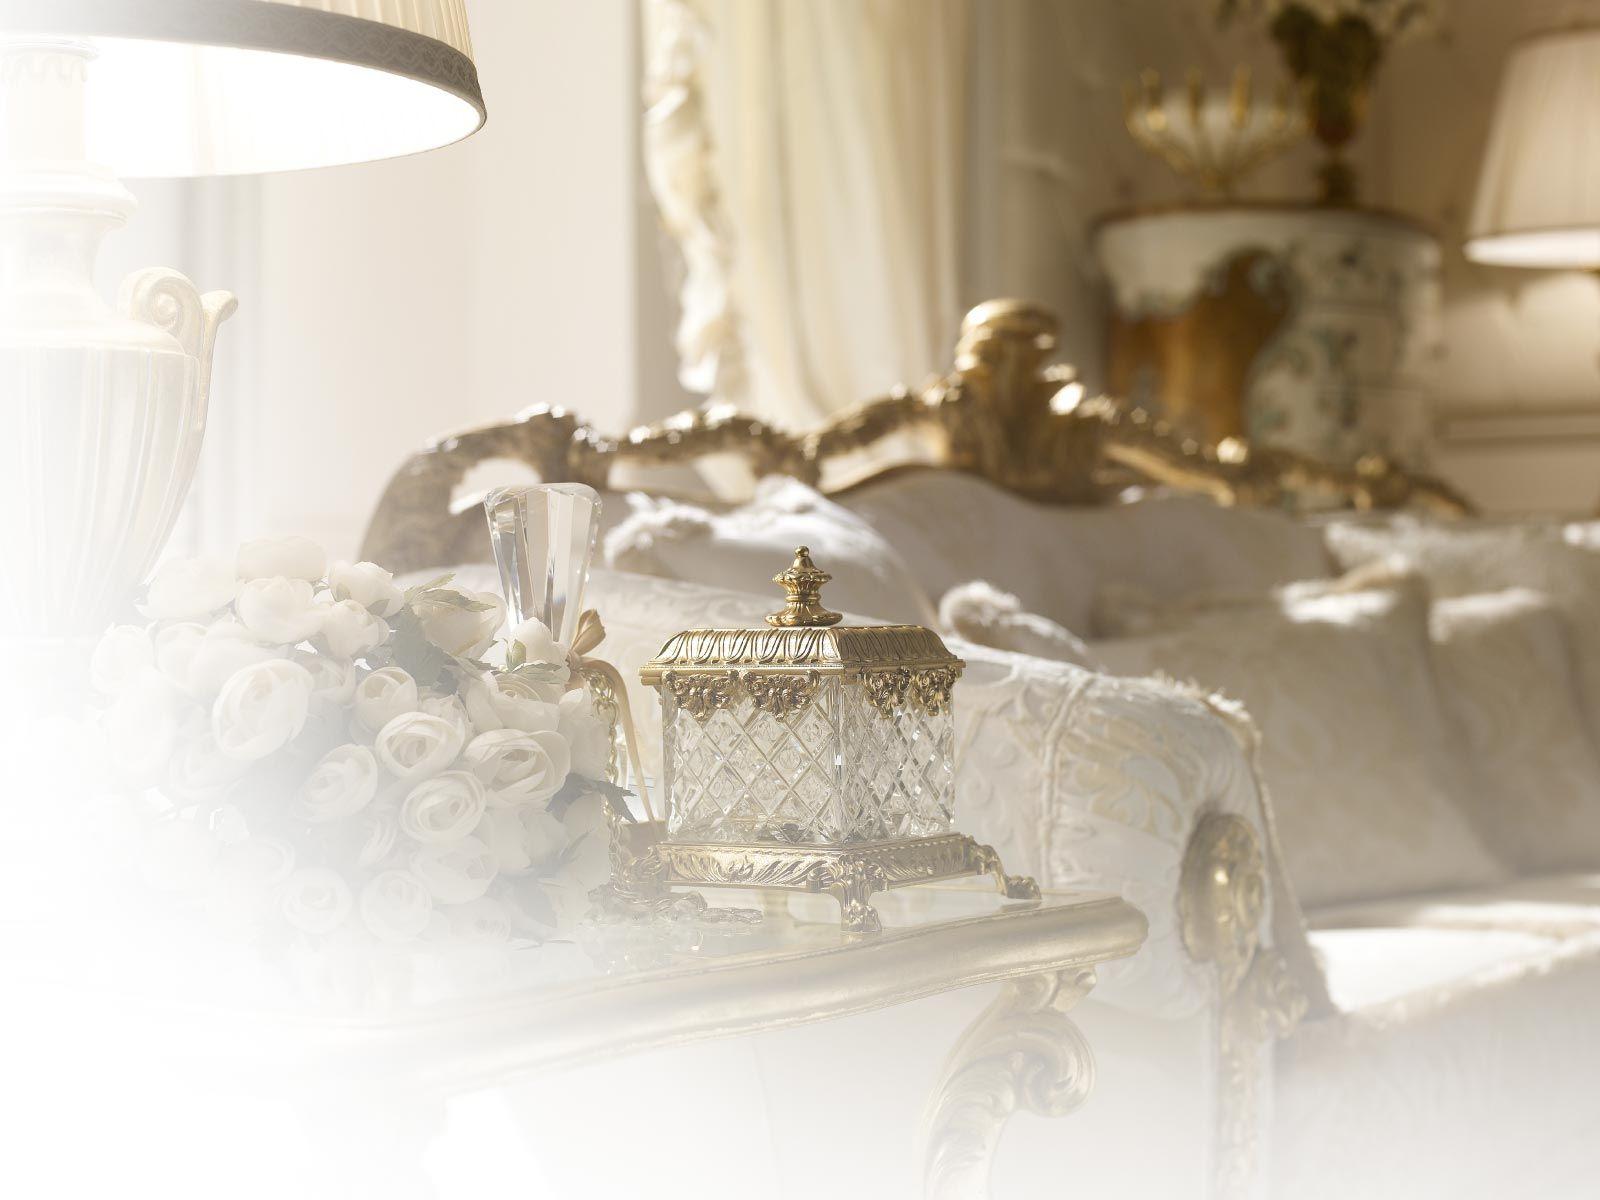 Italian Classic Luxury Wooden Living Room Furniture. | GLAM ...